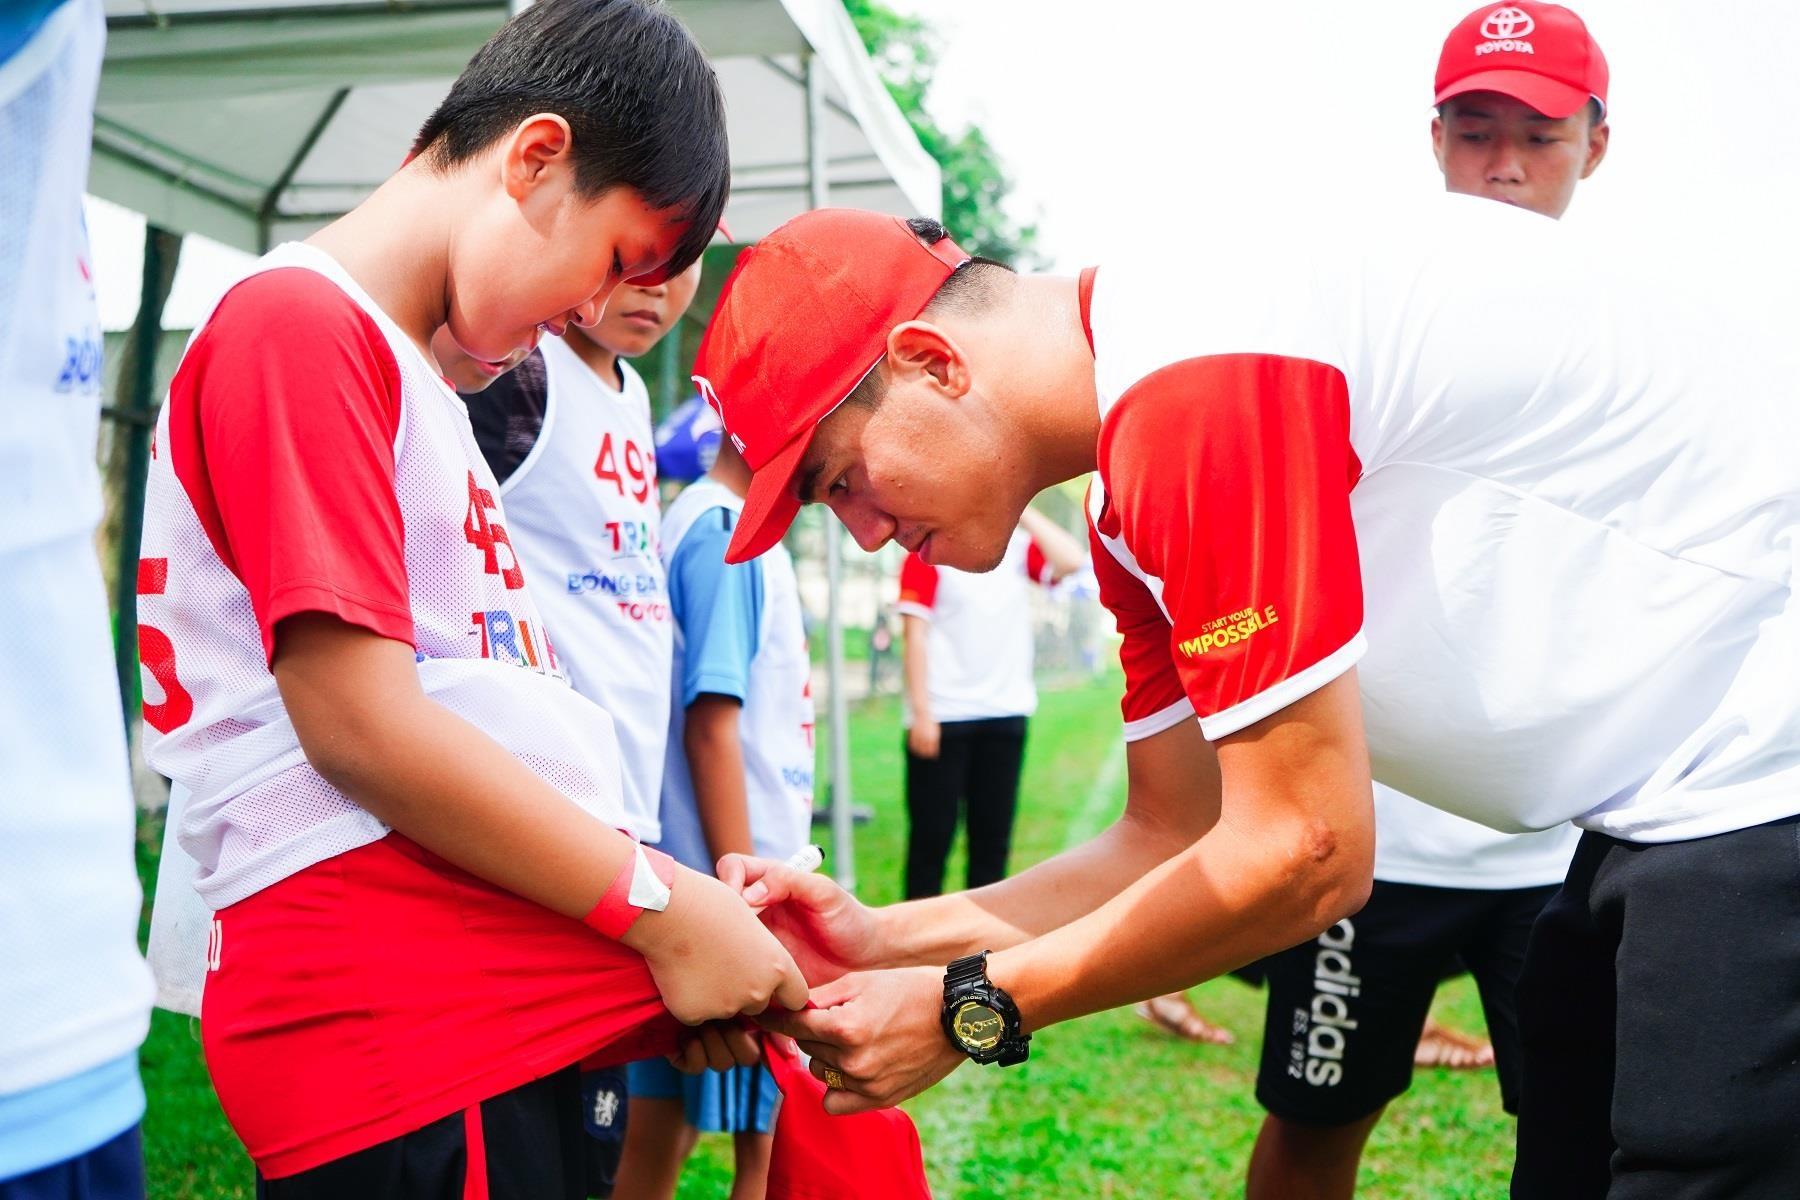 Toyota Junior Football - hanh trinh 'gieo uoc mo' cho cac cau thu nhi hinh anh 11